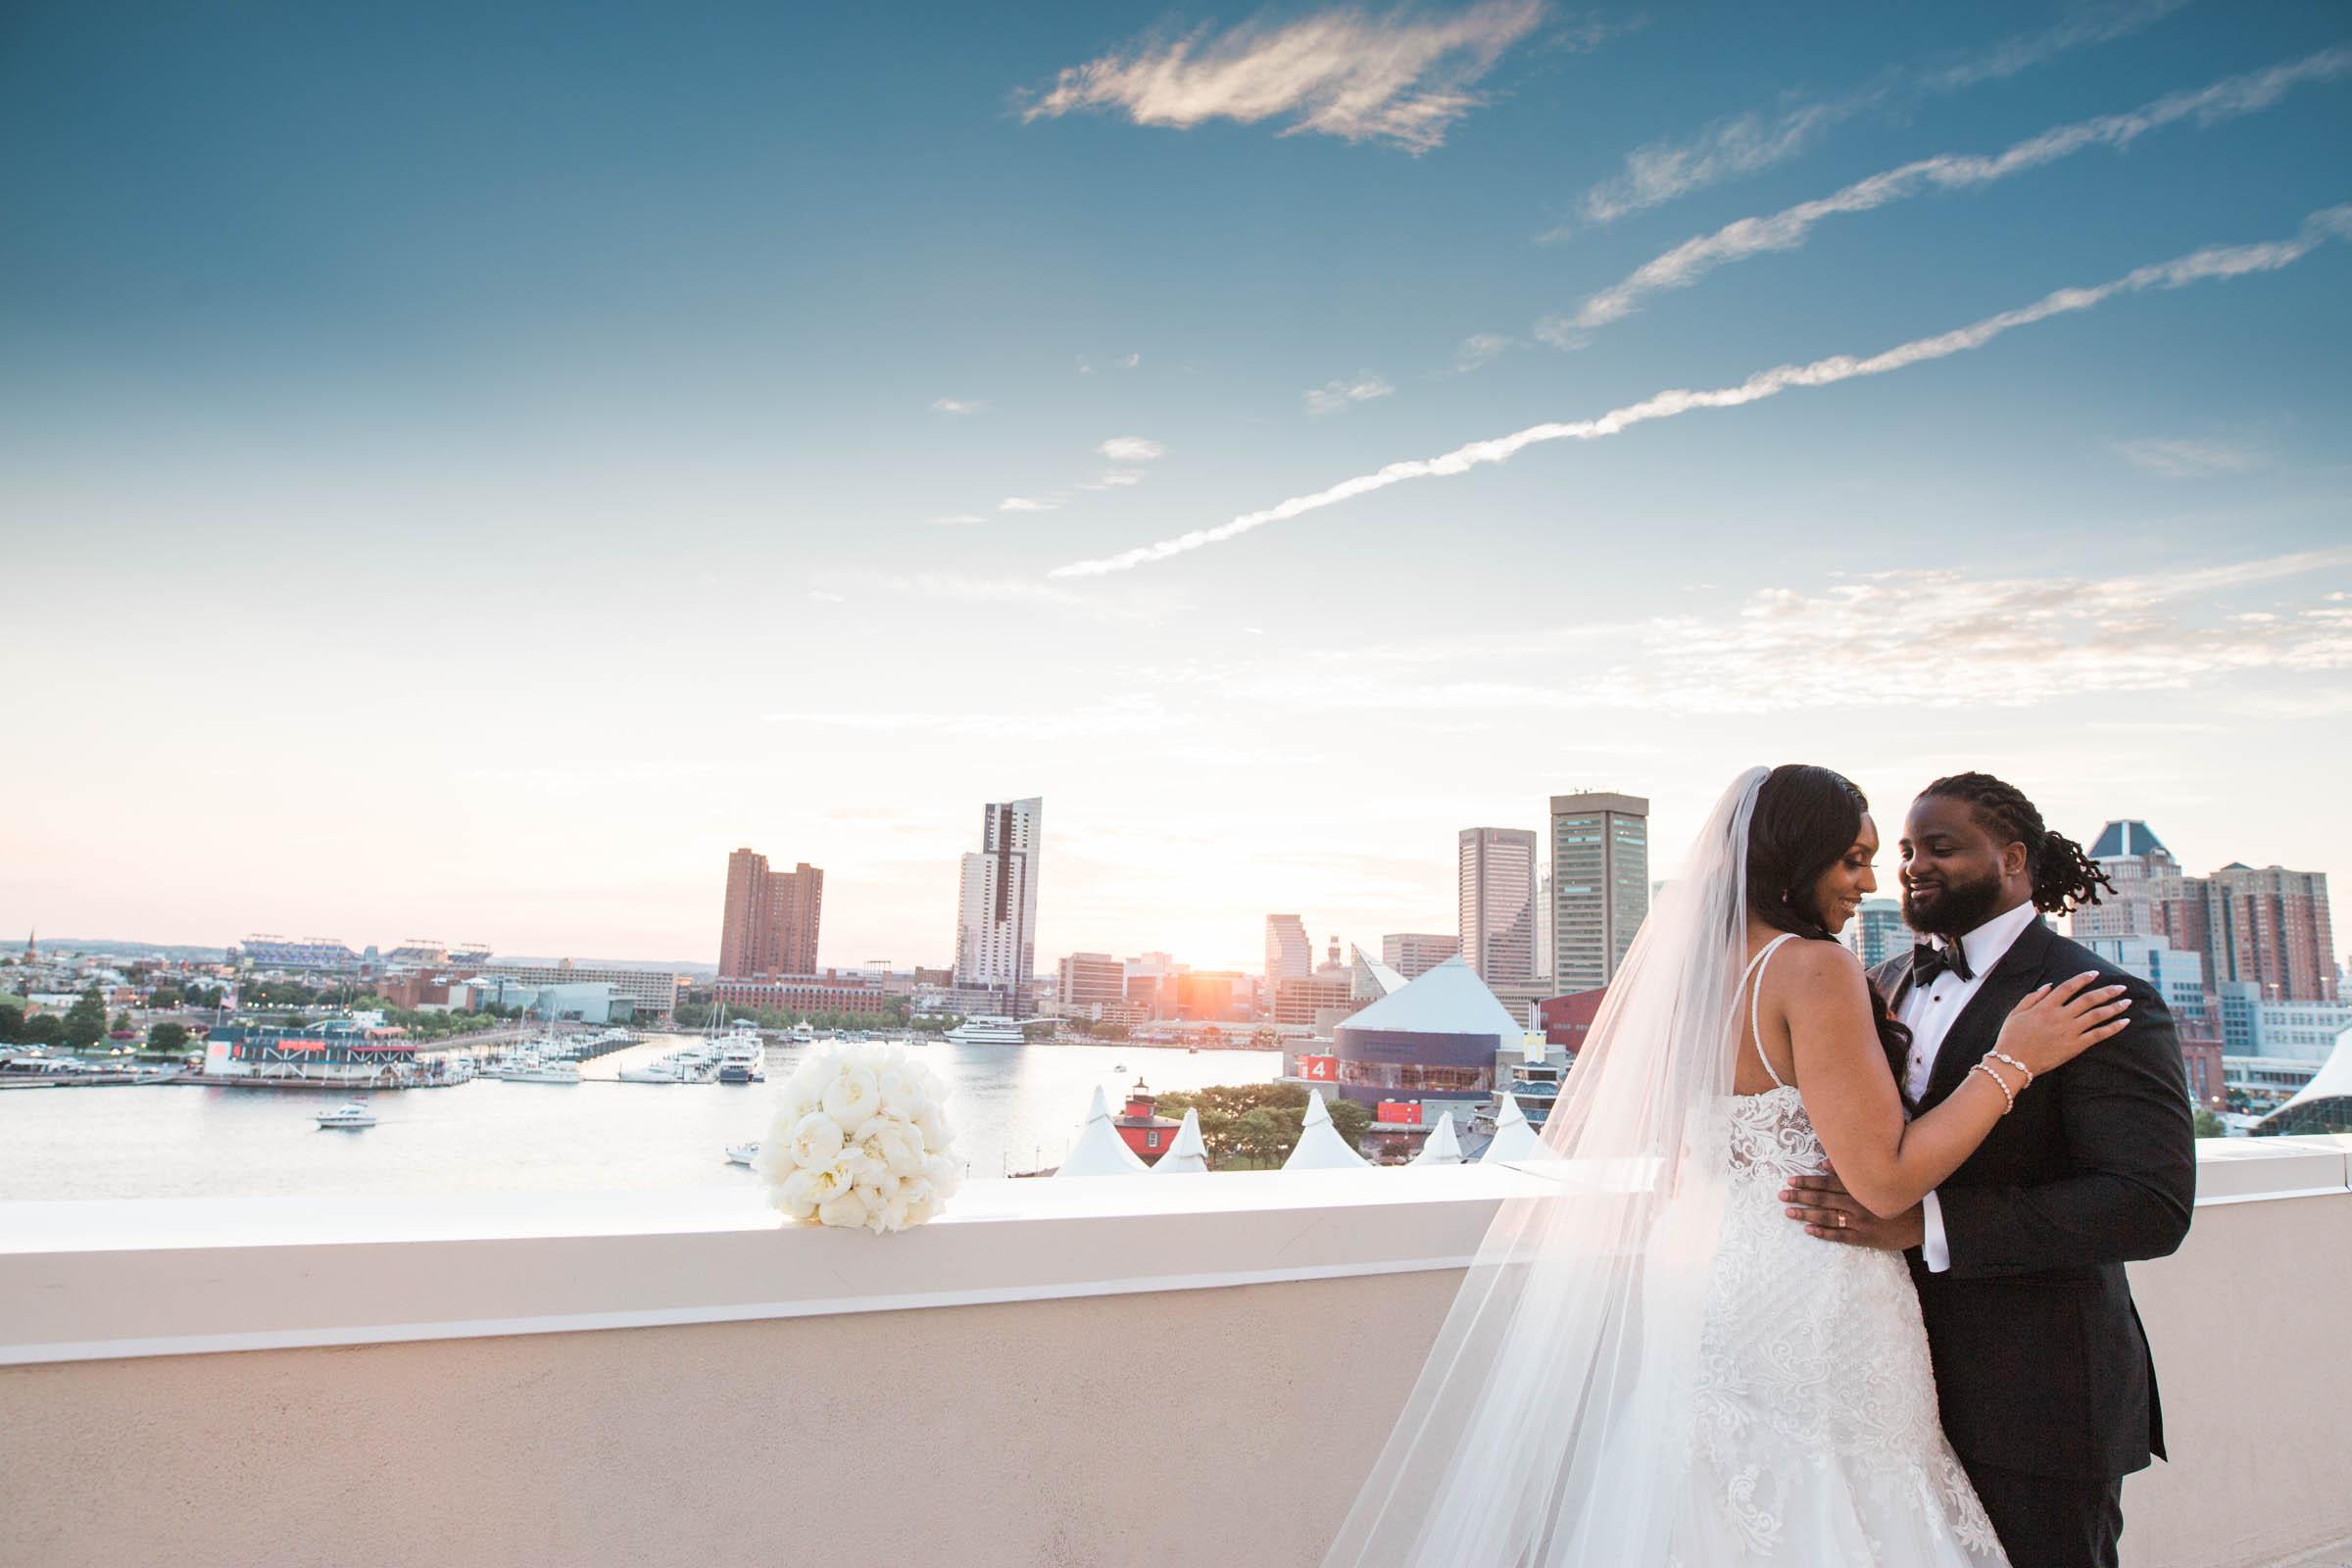 Best Wedding Photographers in Baltimore Maryland Megapixels Media PHOTOGRAPHY (25 of 25).jpg